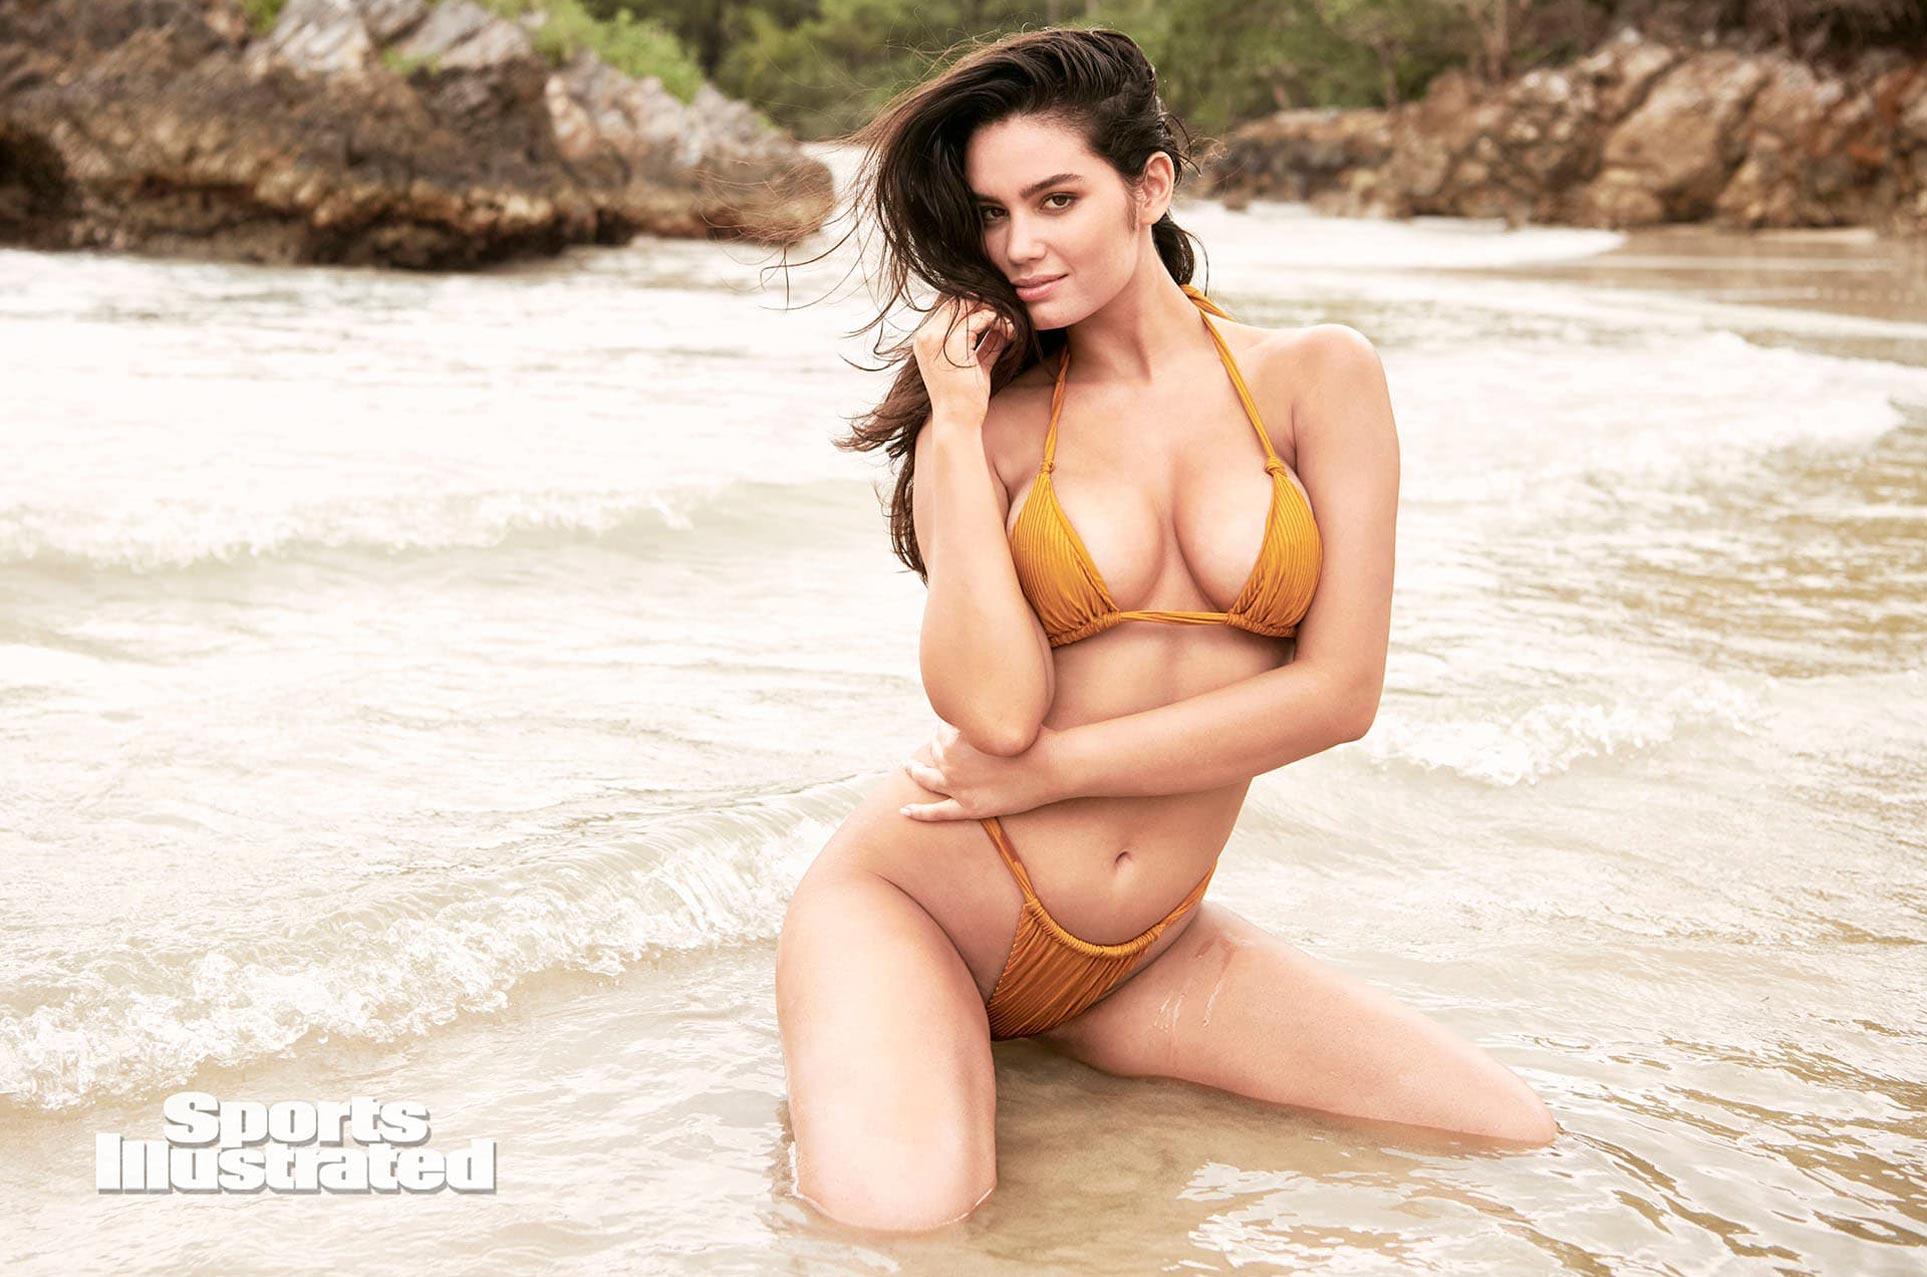 Энн де Паула в каталоге купальников Sports Illustrated Swimsuit 2020 / фото 01